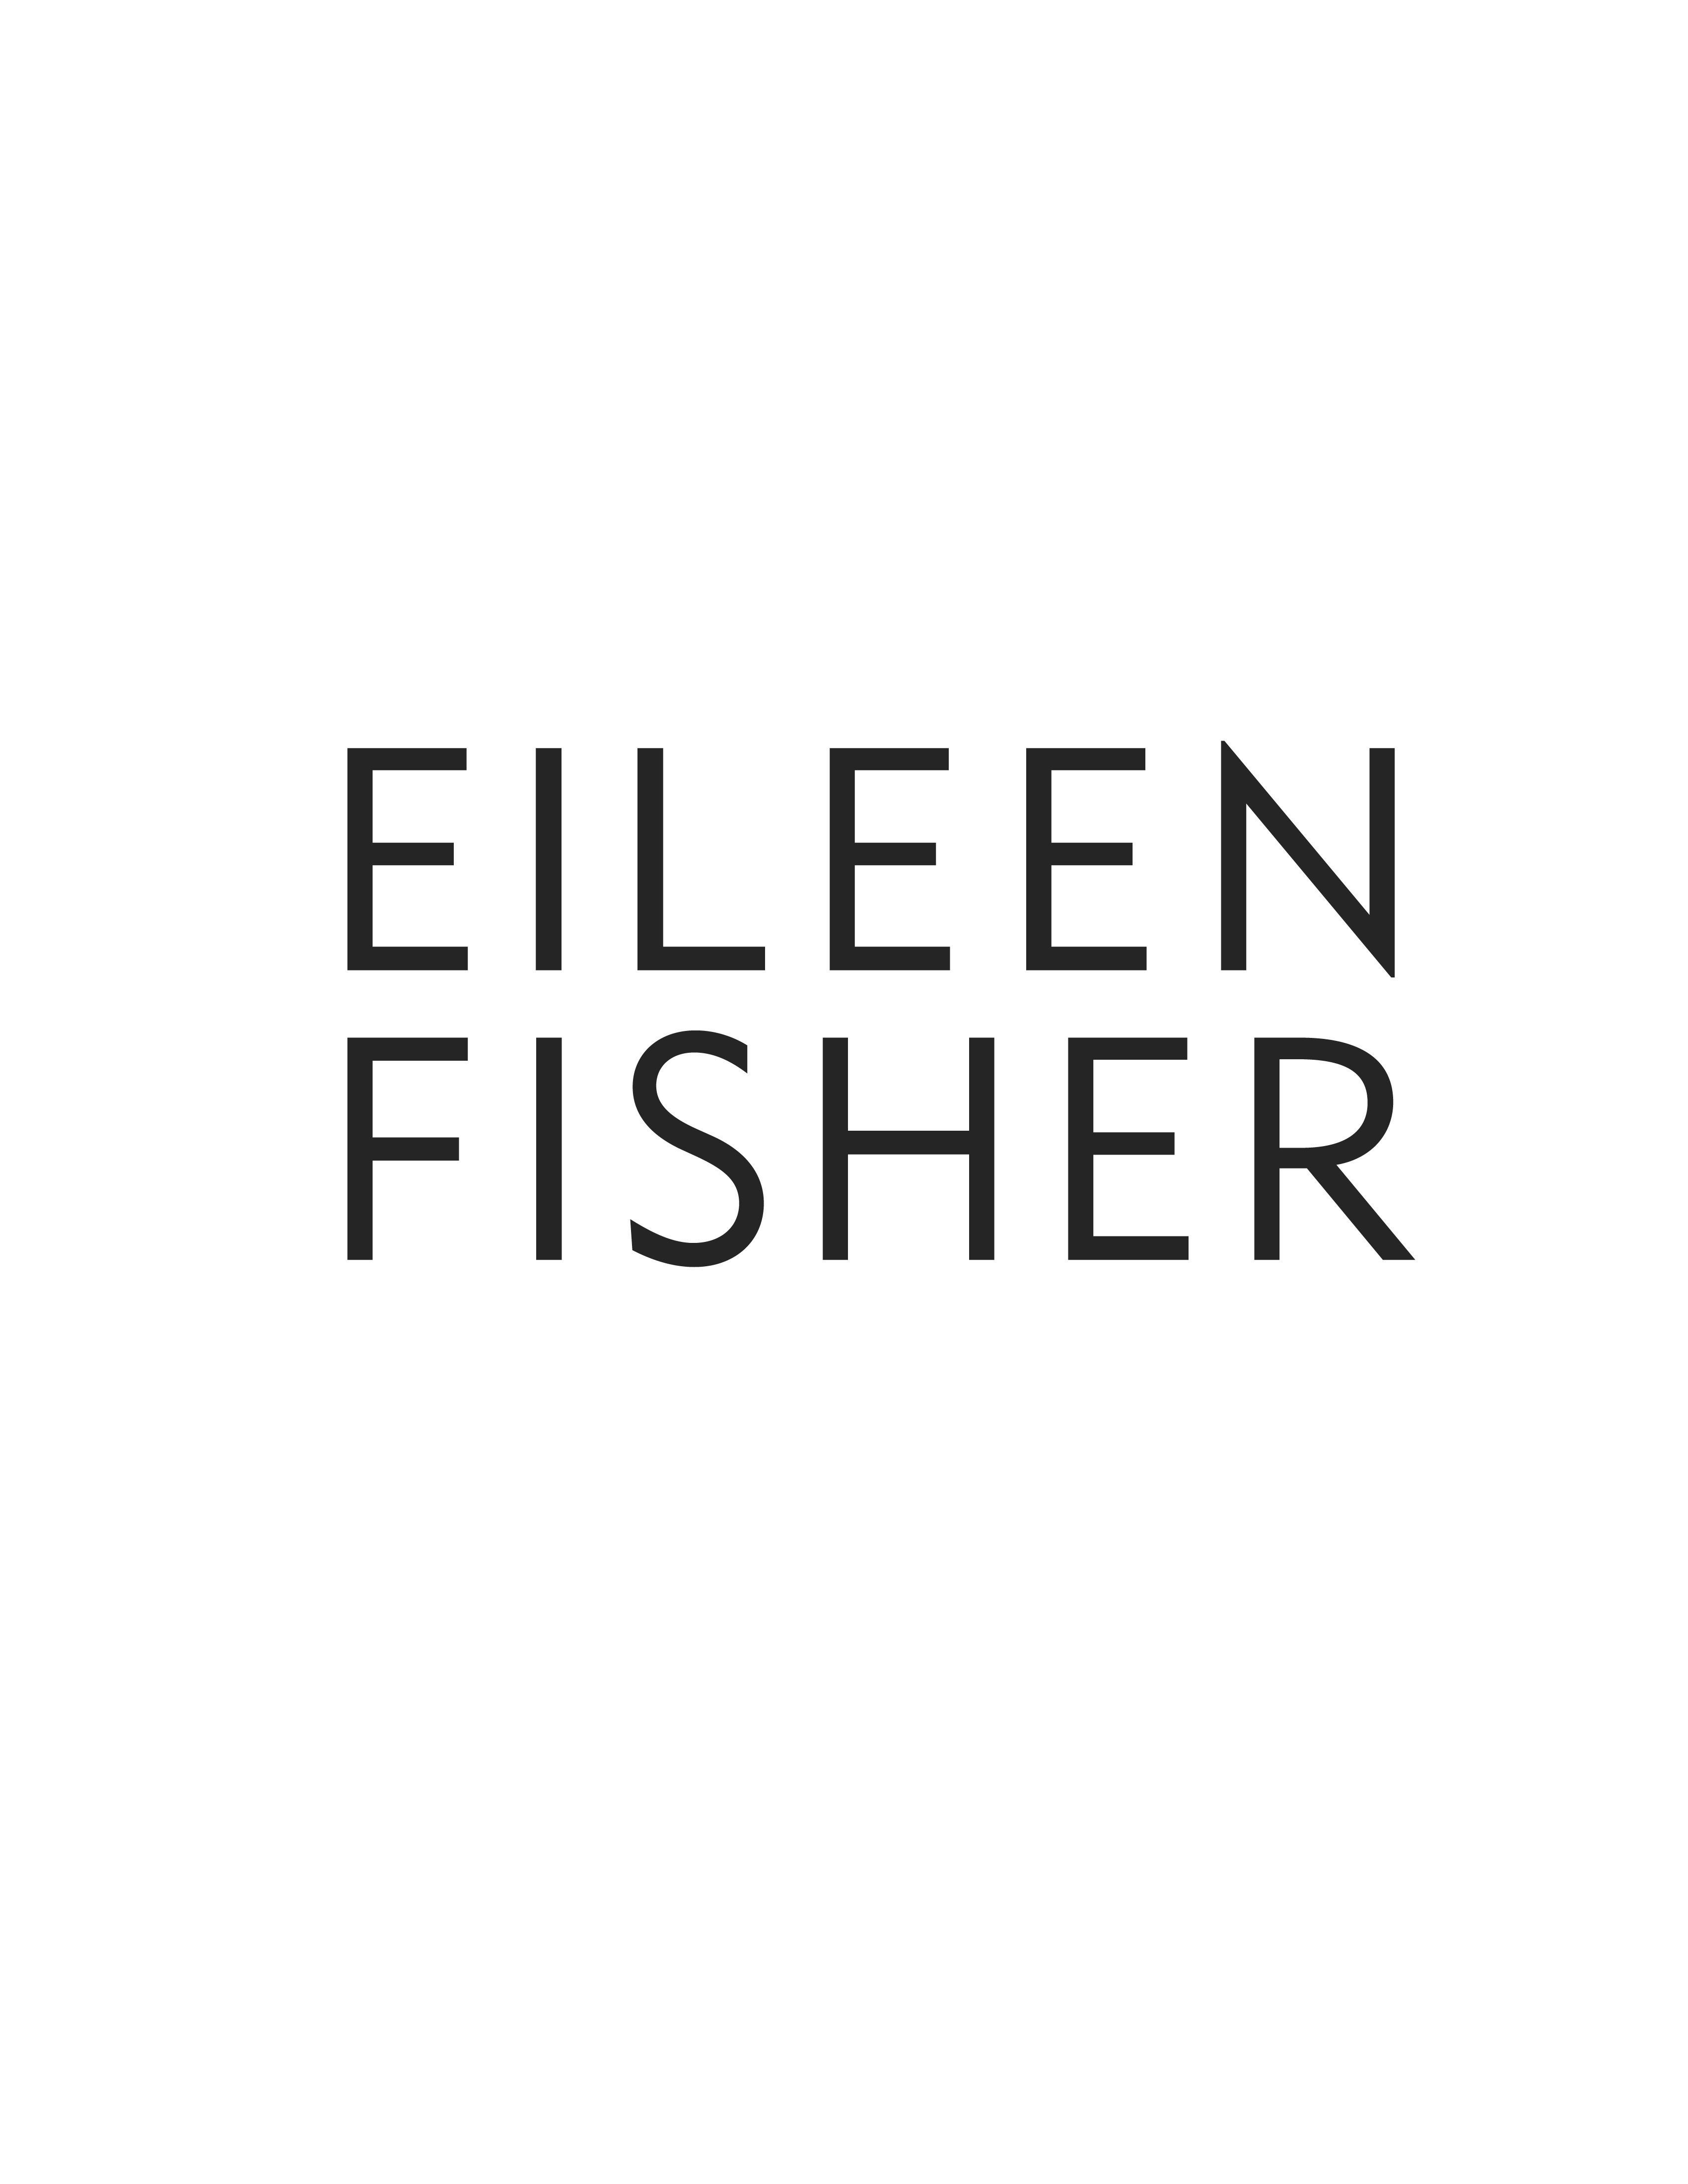 Eileen fisher Logos.